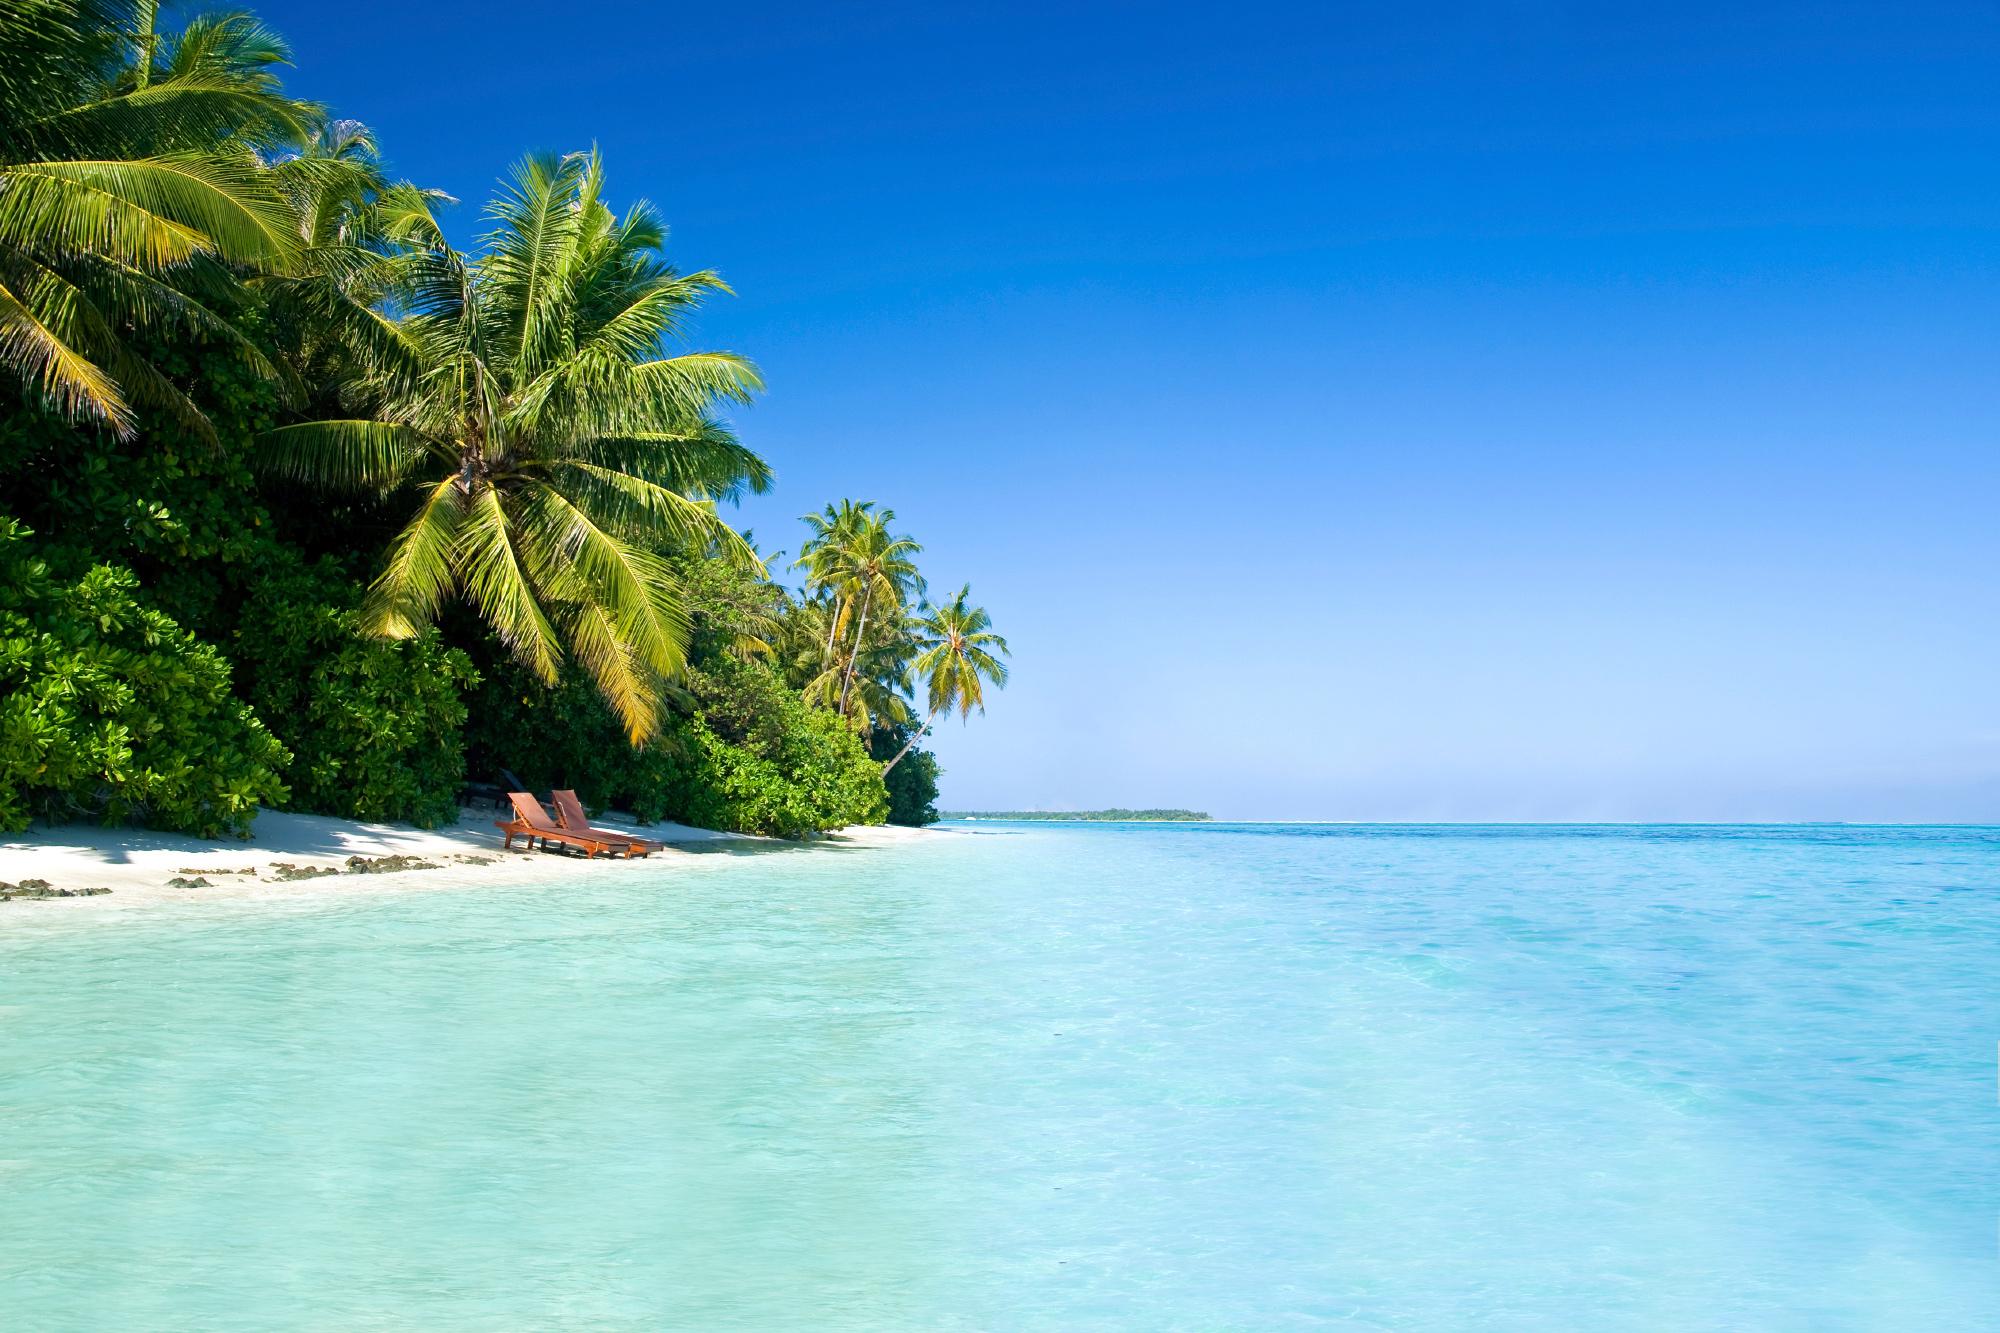 badeurlaub » günstiger urlaub am meer » strandurlaub